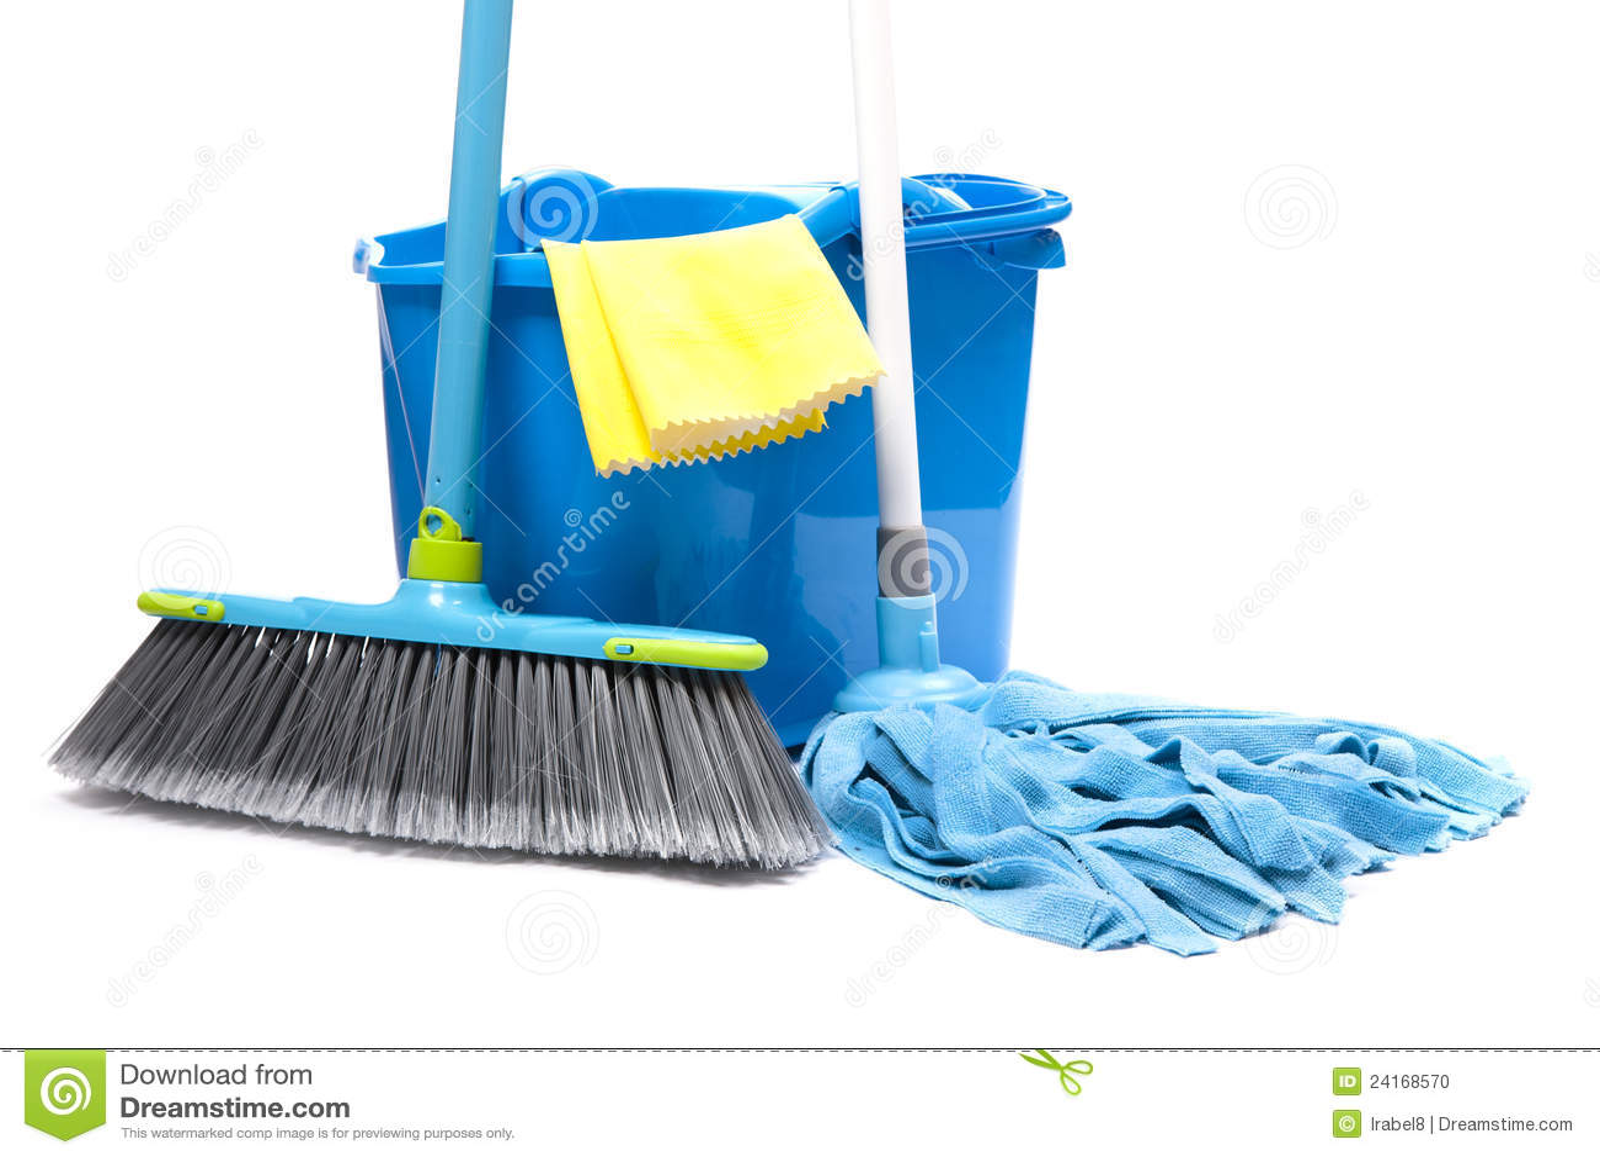 Bucket With Mop, Brush Stock Photo